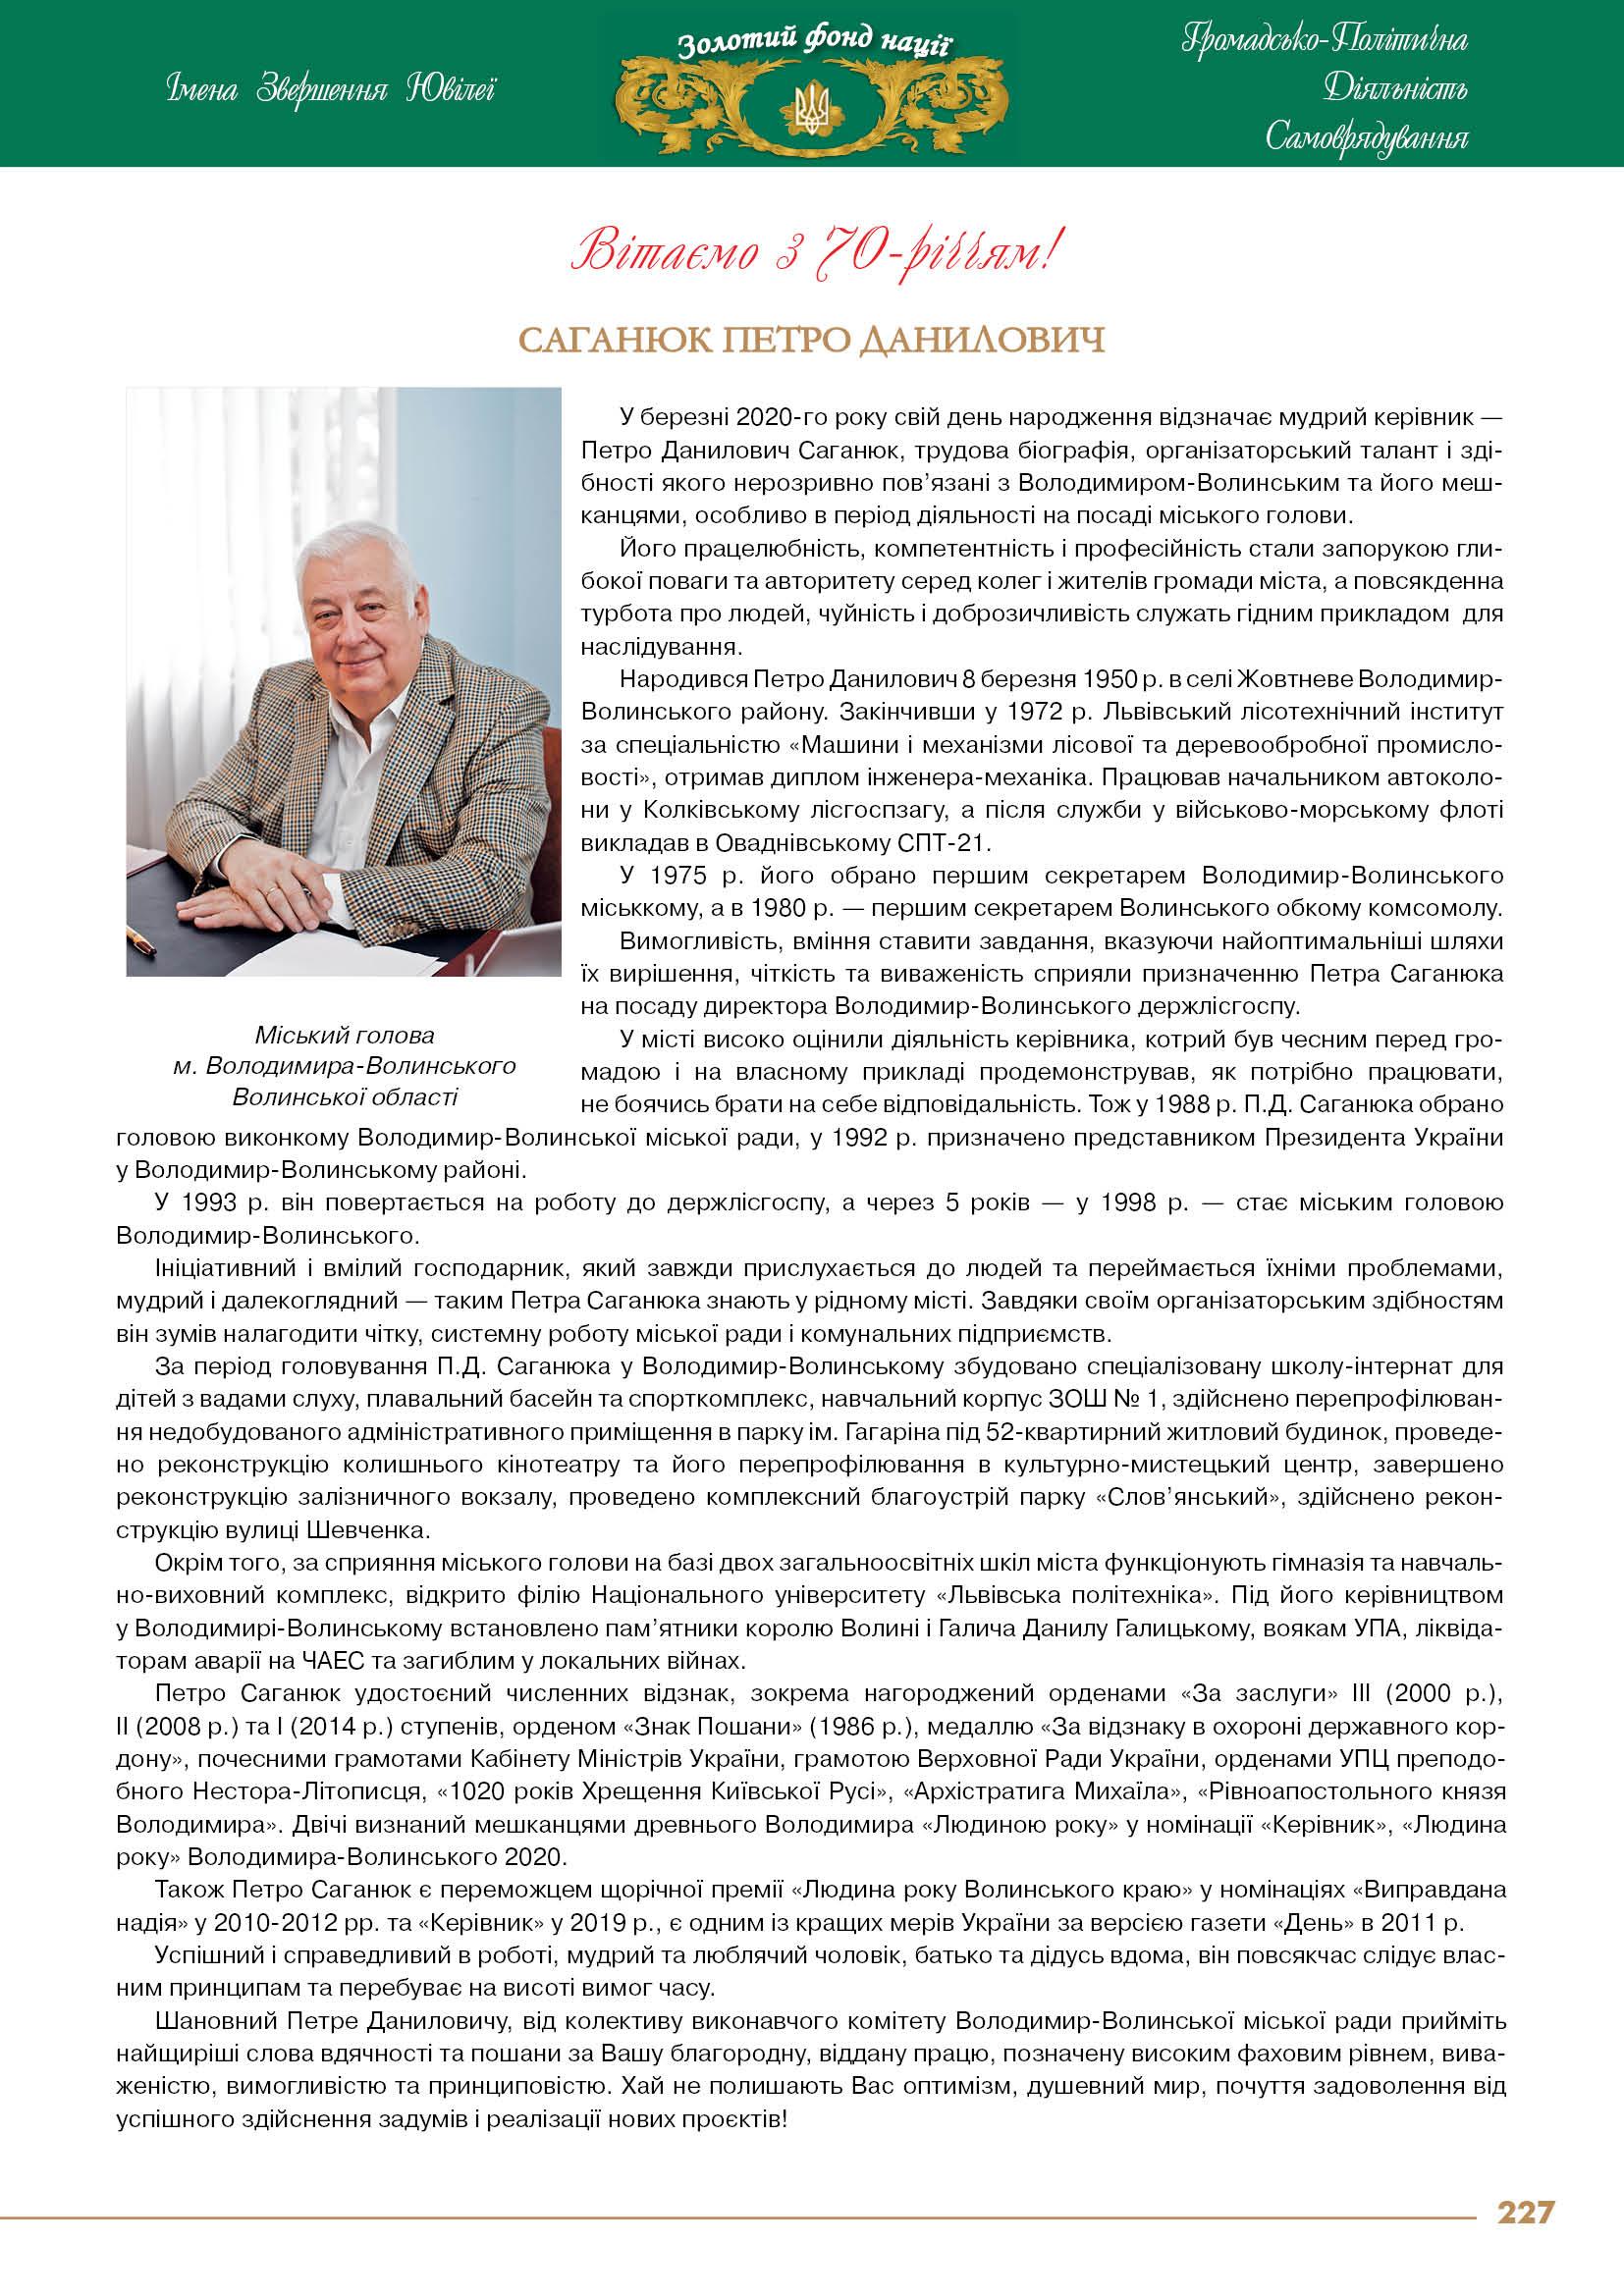 Саганюк Петро Данилович